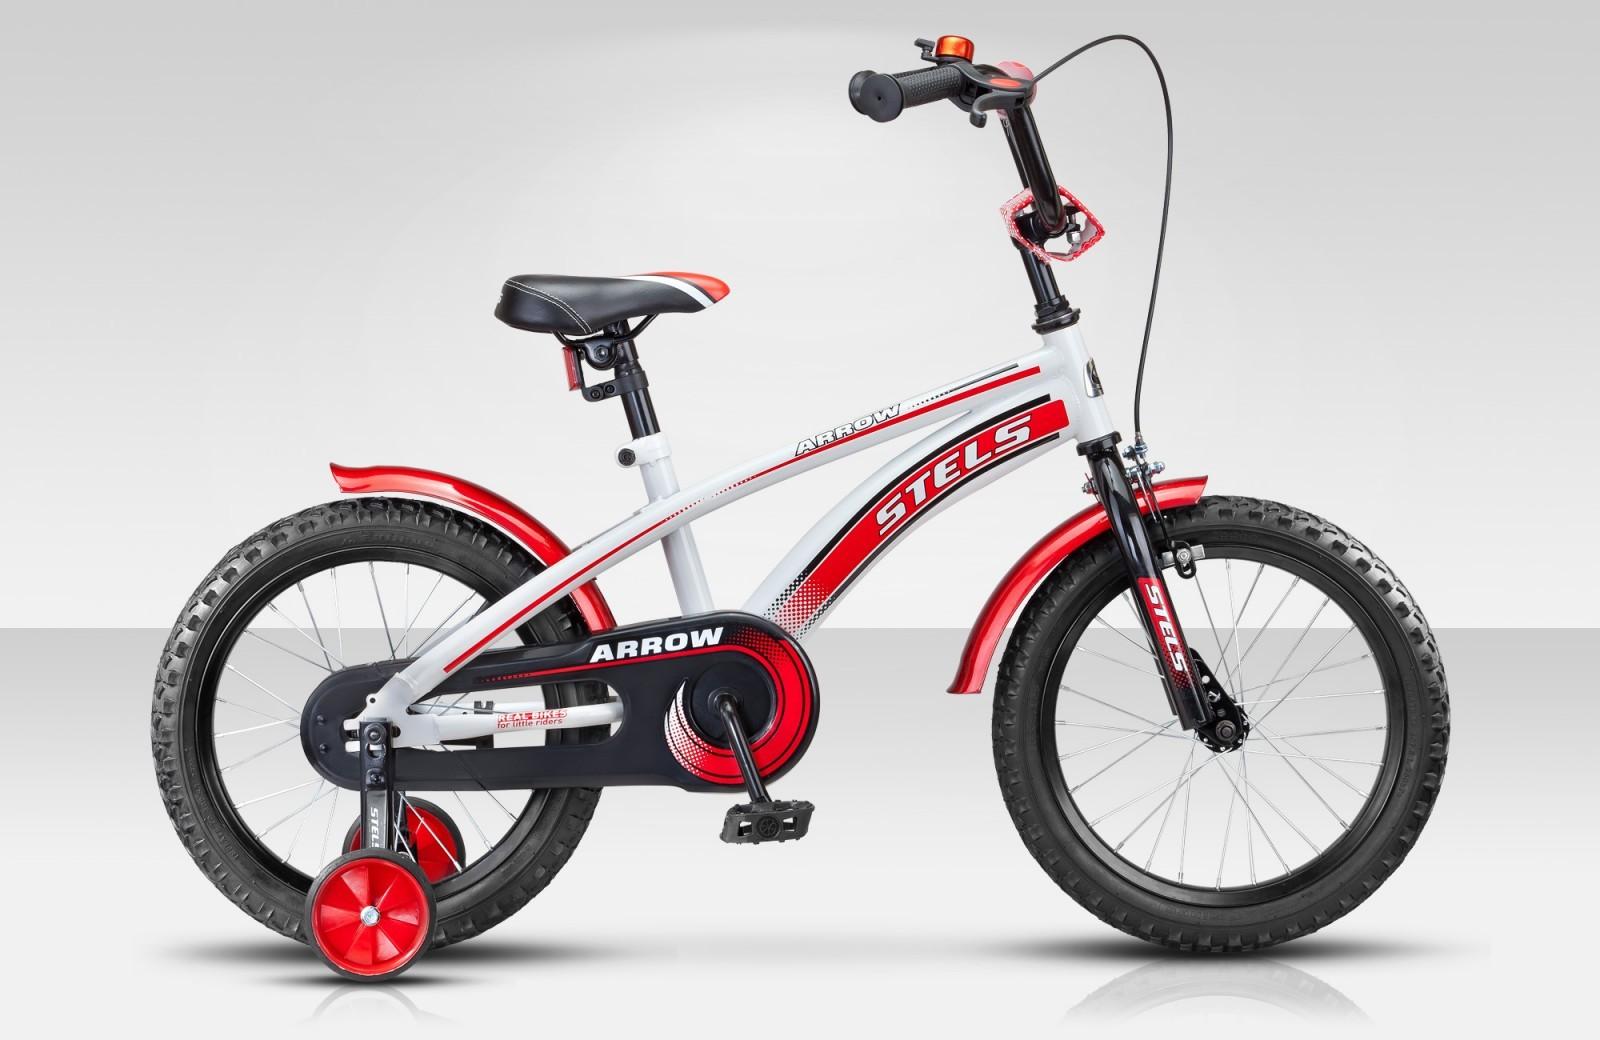 Велосипед Stels Arrow 12 (2014)